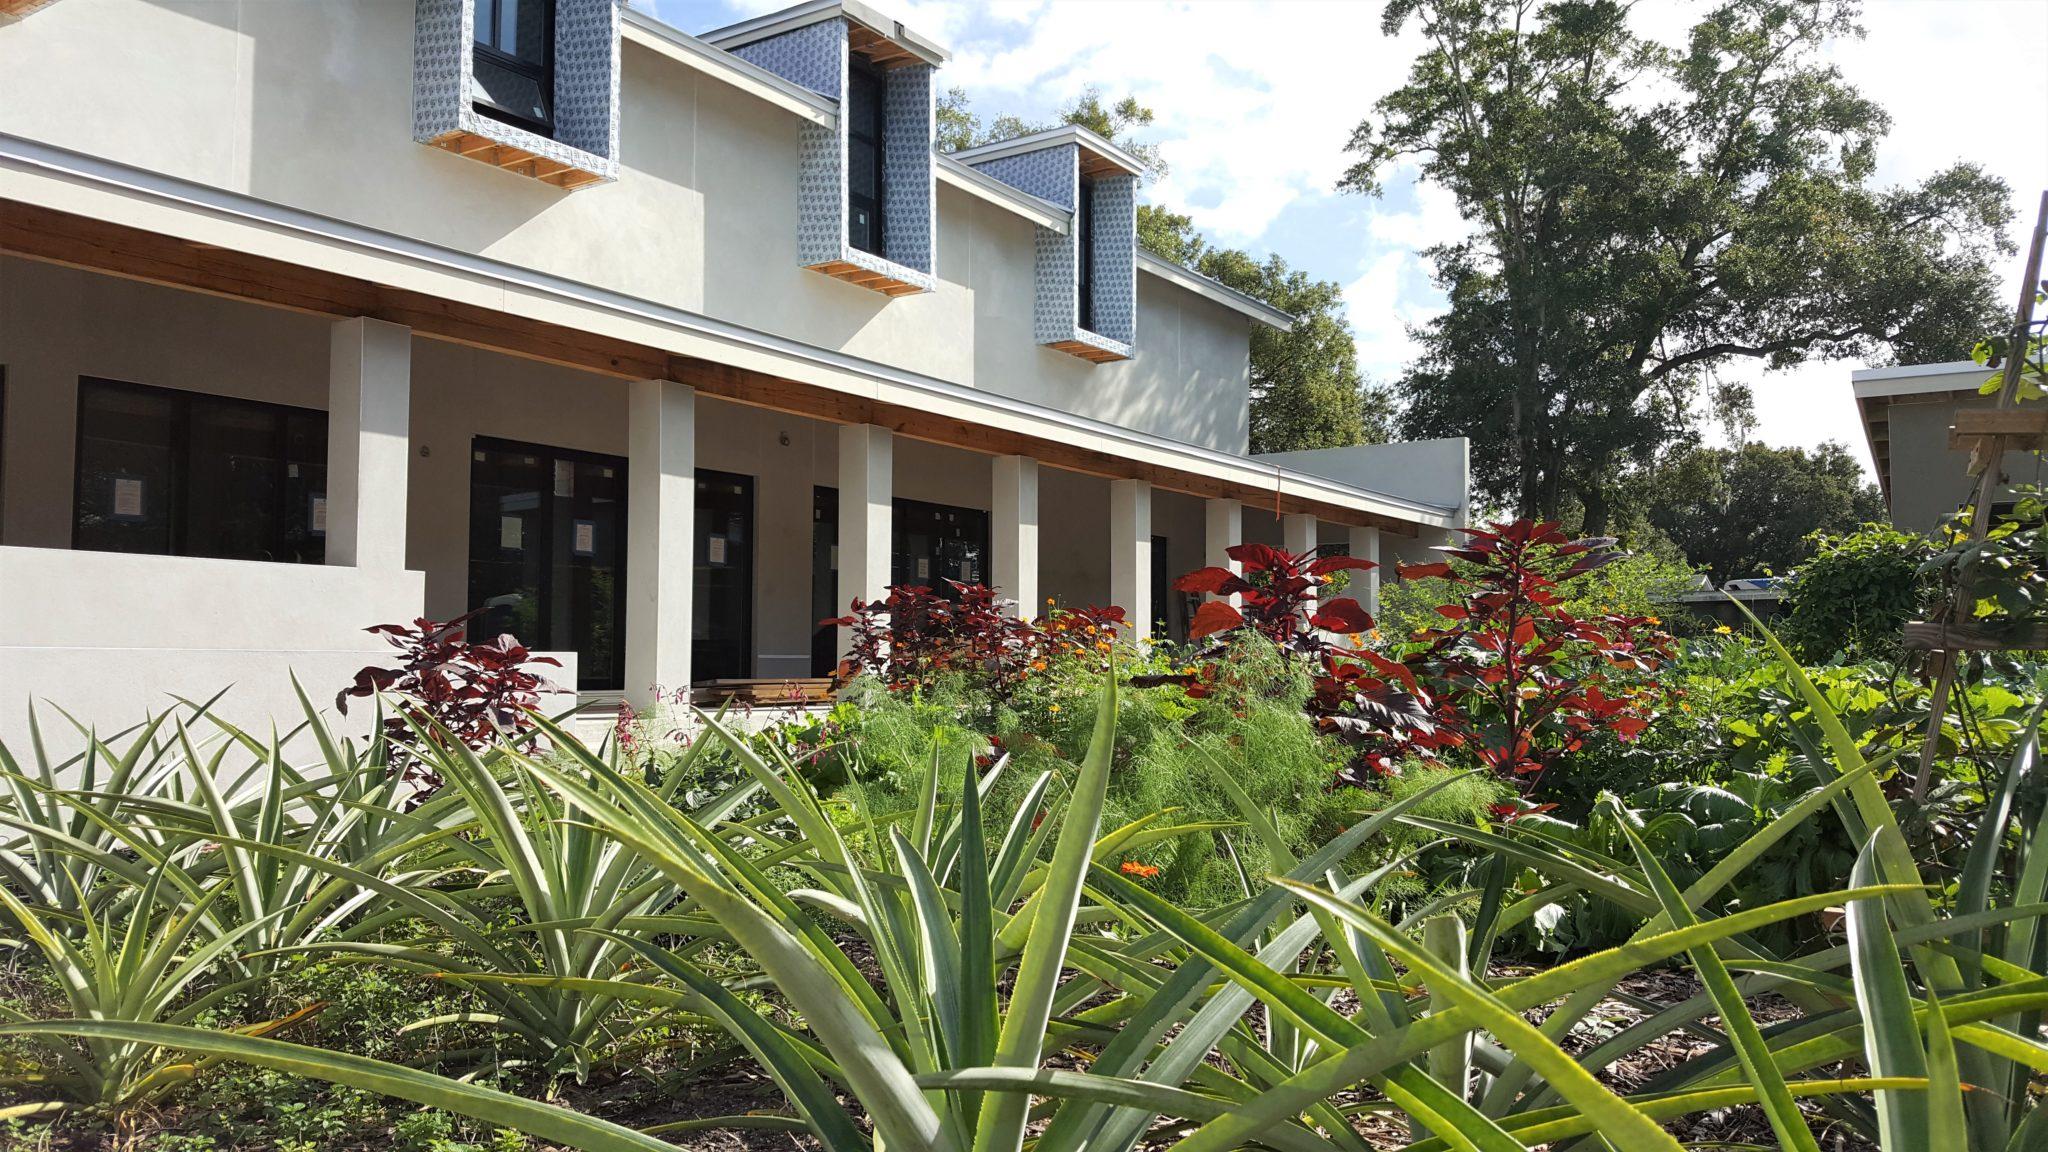 emeril lagasse foundation kitchen house and garden nears